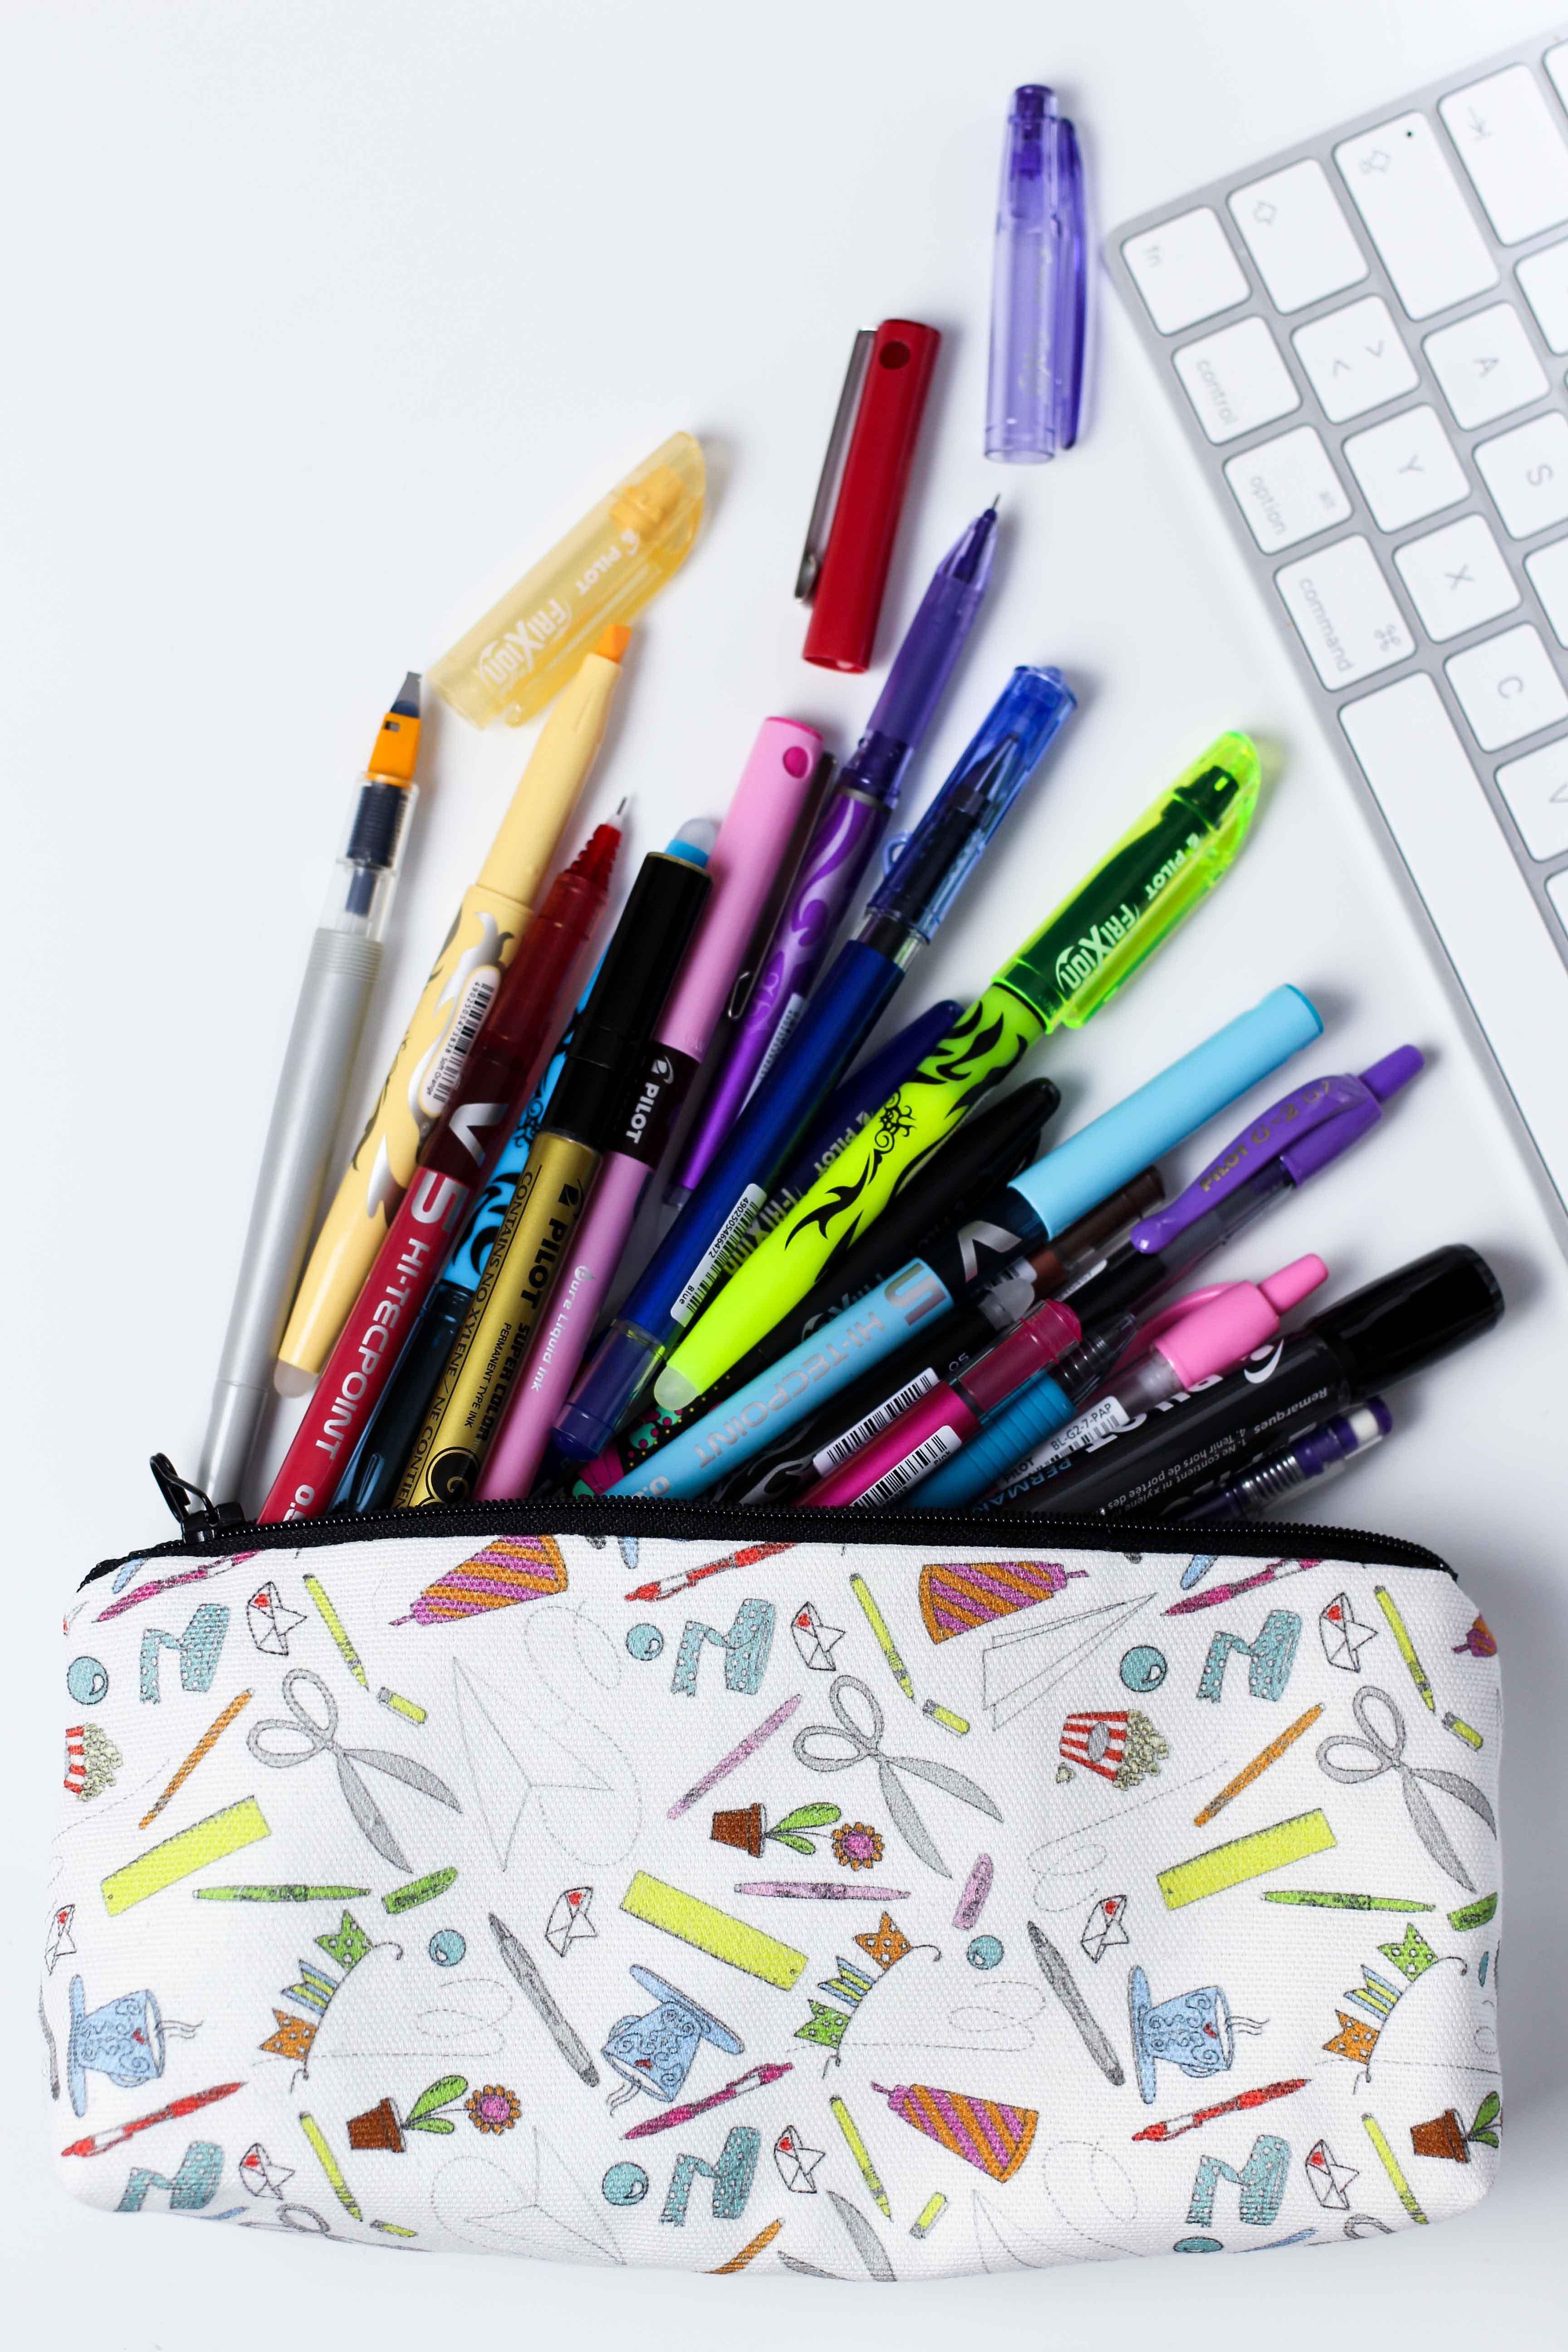 Blogger Adventskalender Mäppchen Stifte Pilot Pen Lettering Bleistift Textmarker Gelschreiber Blog Organizer kreativ 2